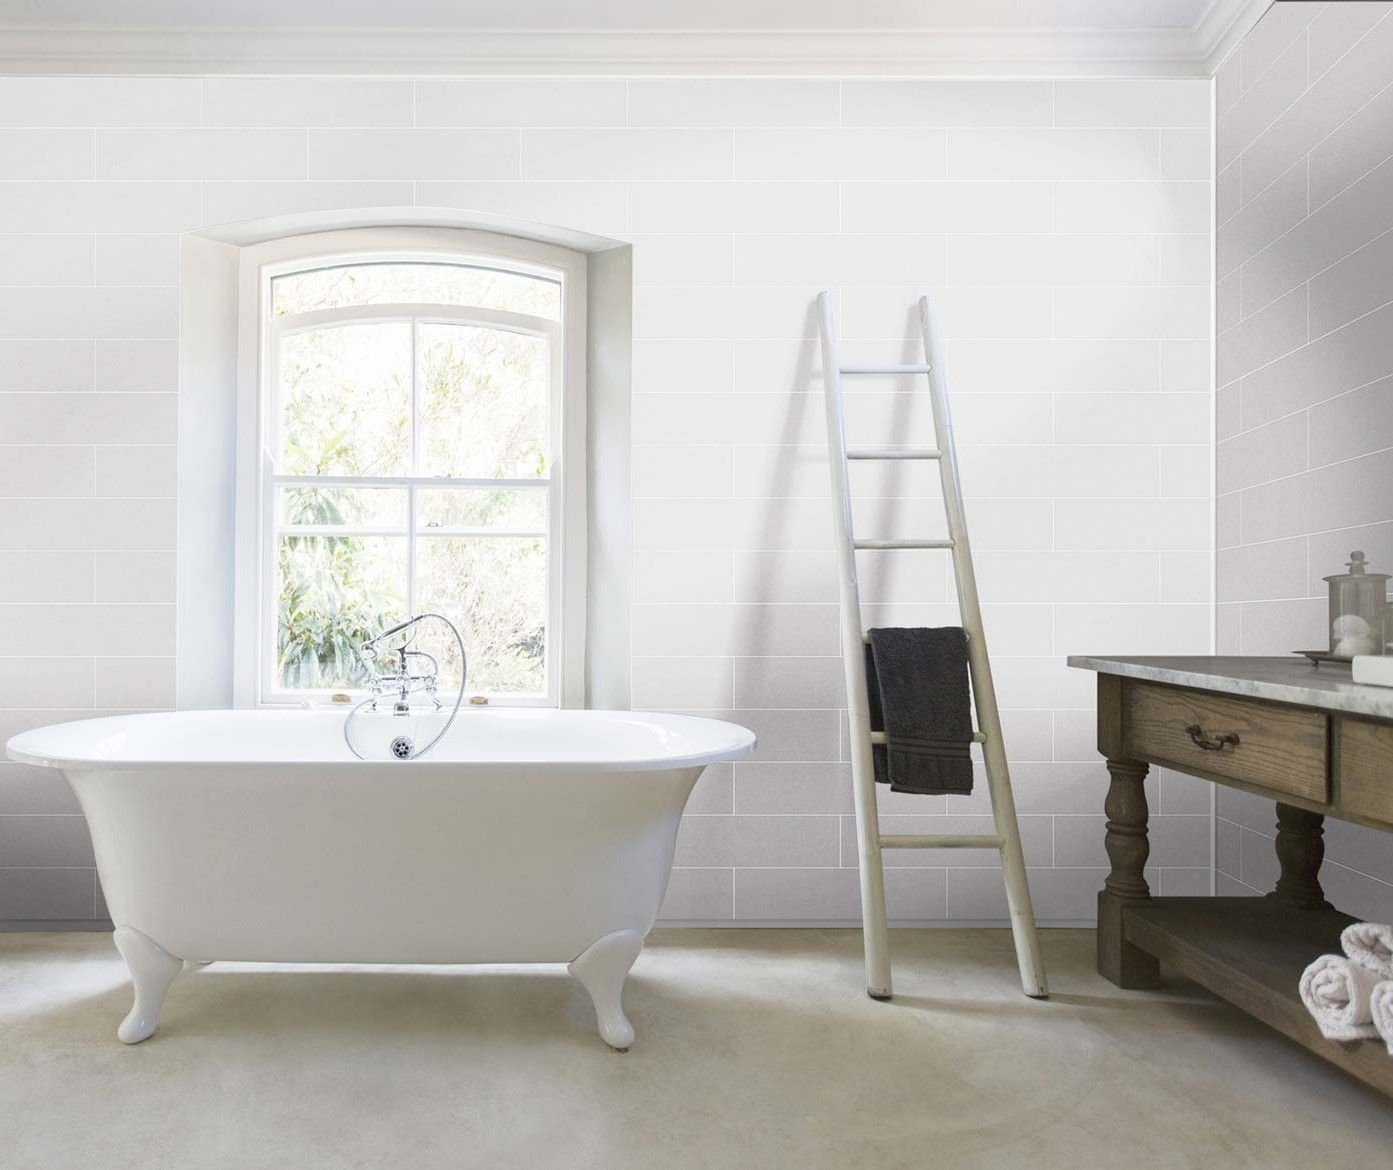 Modernes Wandpaneel Wandpaneele Badezimmerideen Badezimmer Kaufen